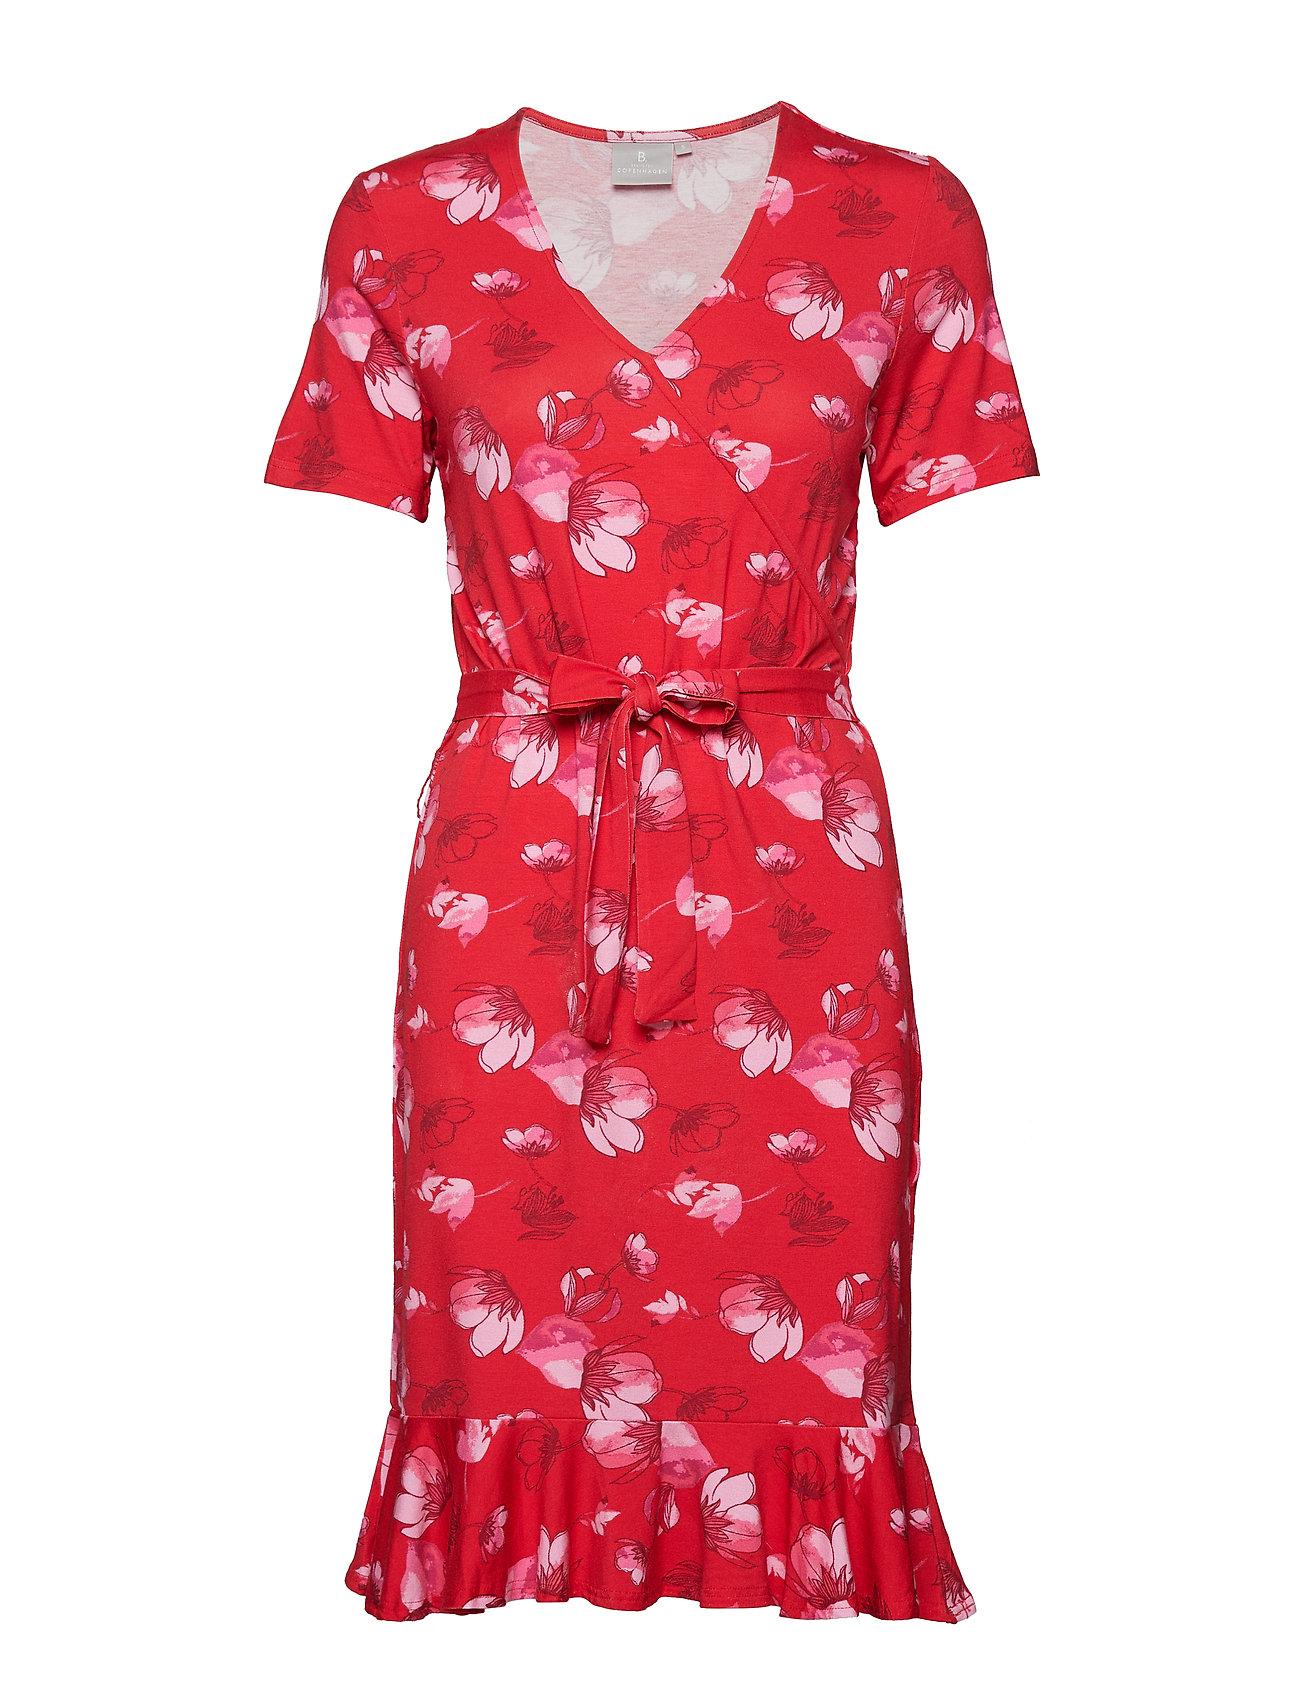 Brandtex Dress-jersey - FIESTA RED